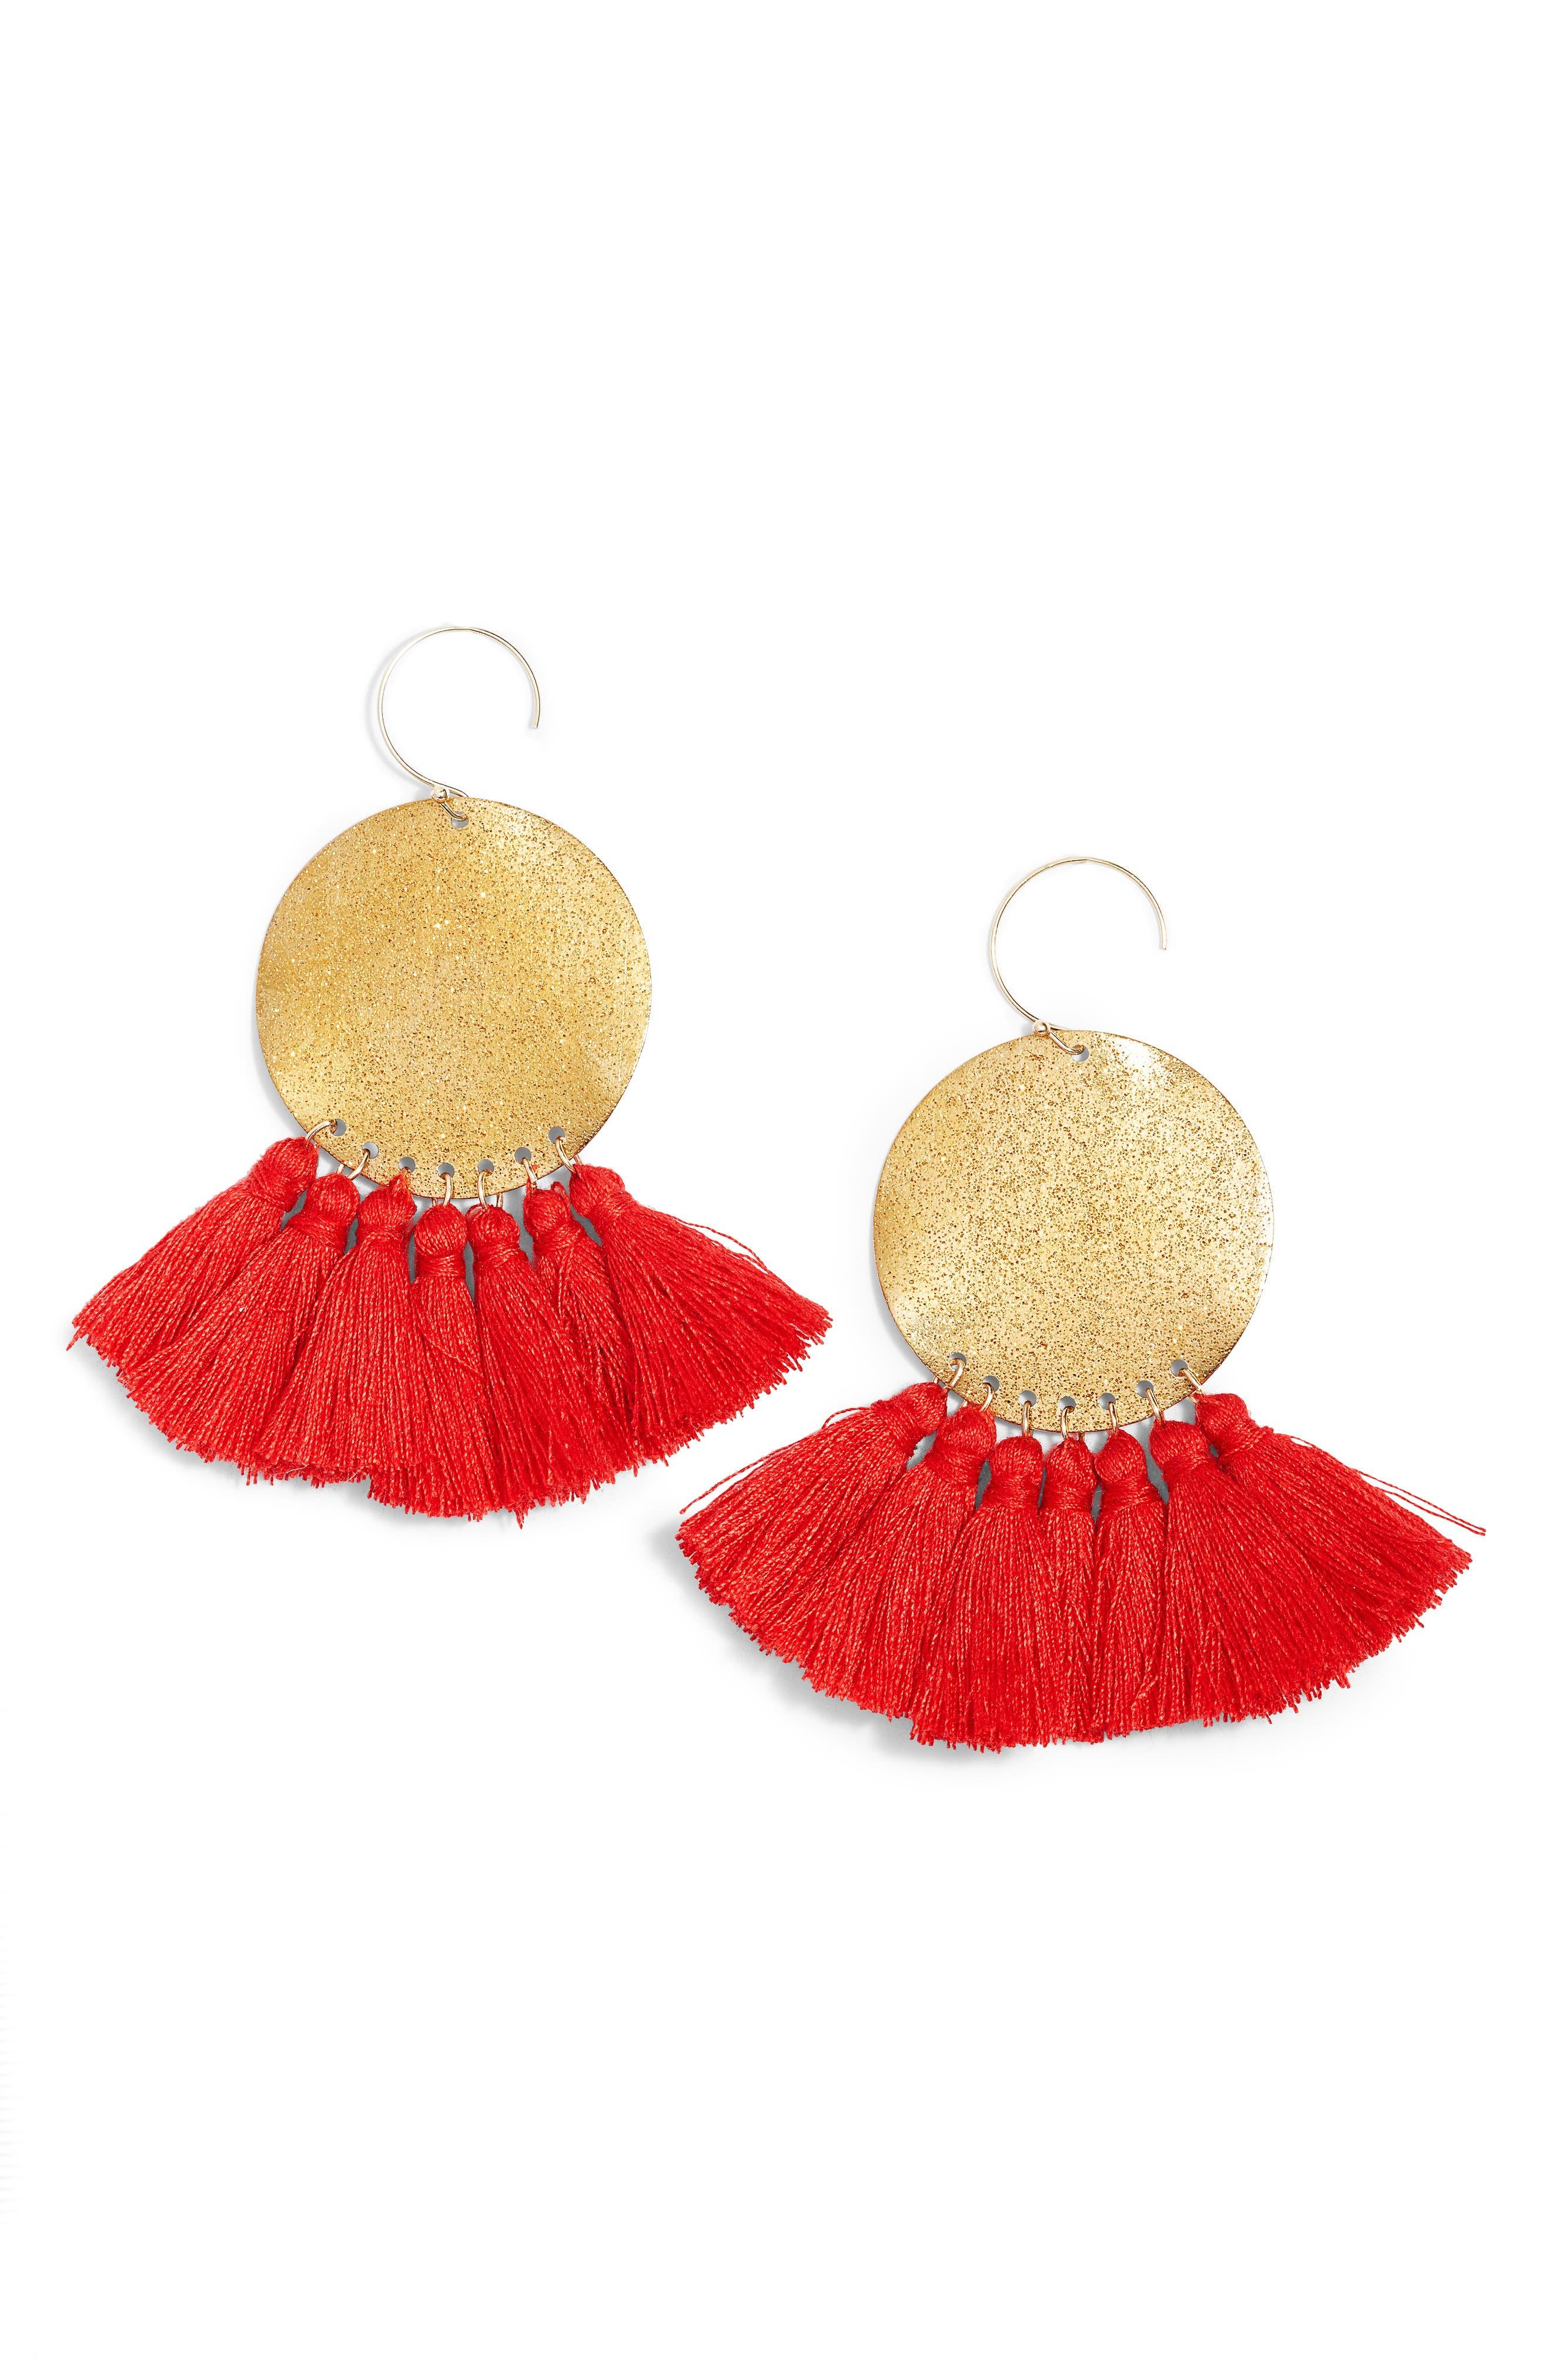 Lunar Tassel Earrings,                         Main,                         color, Gold/ Red